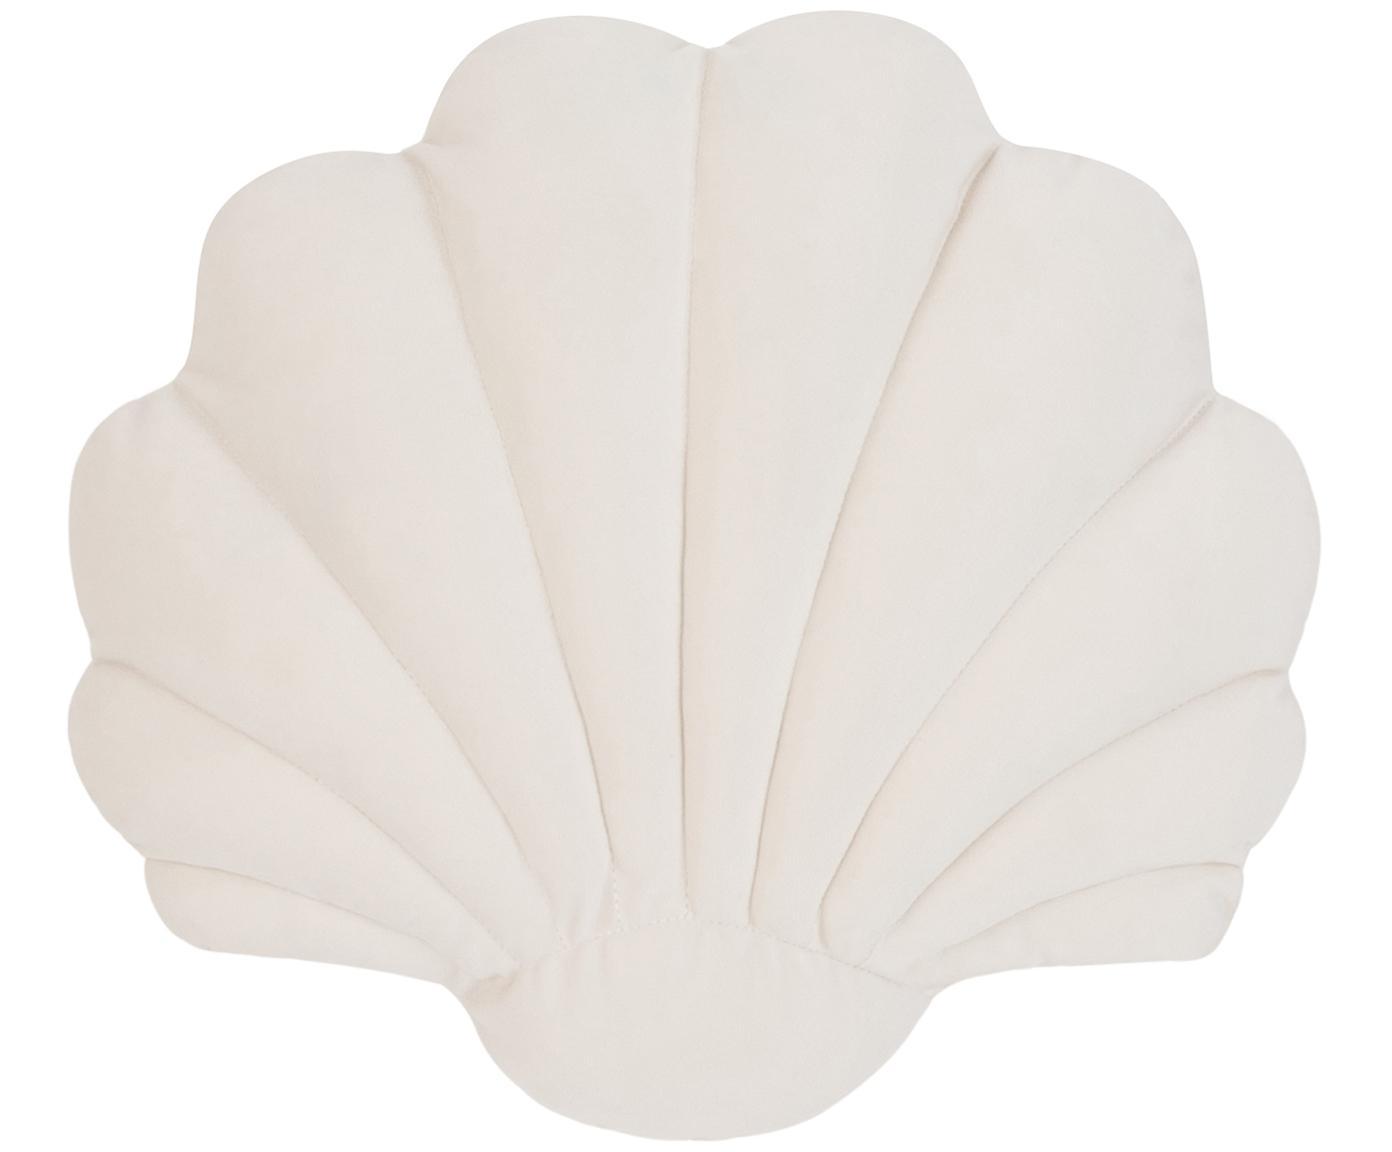 Cojín de terciopelo Shel, con relleno, Parte delantera: 100%terciopelo de algodó, Parte trasera: 100%algodón, Blanco crema, An 28 x L 30 cm